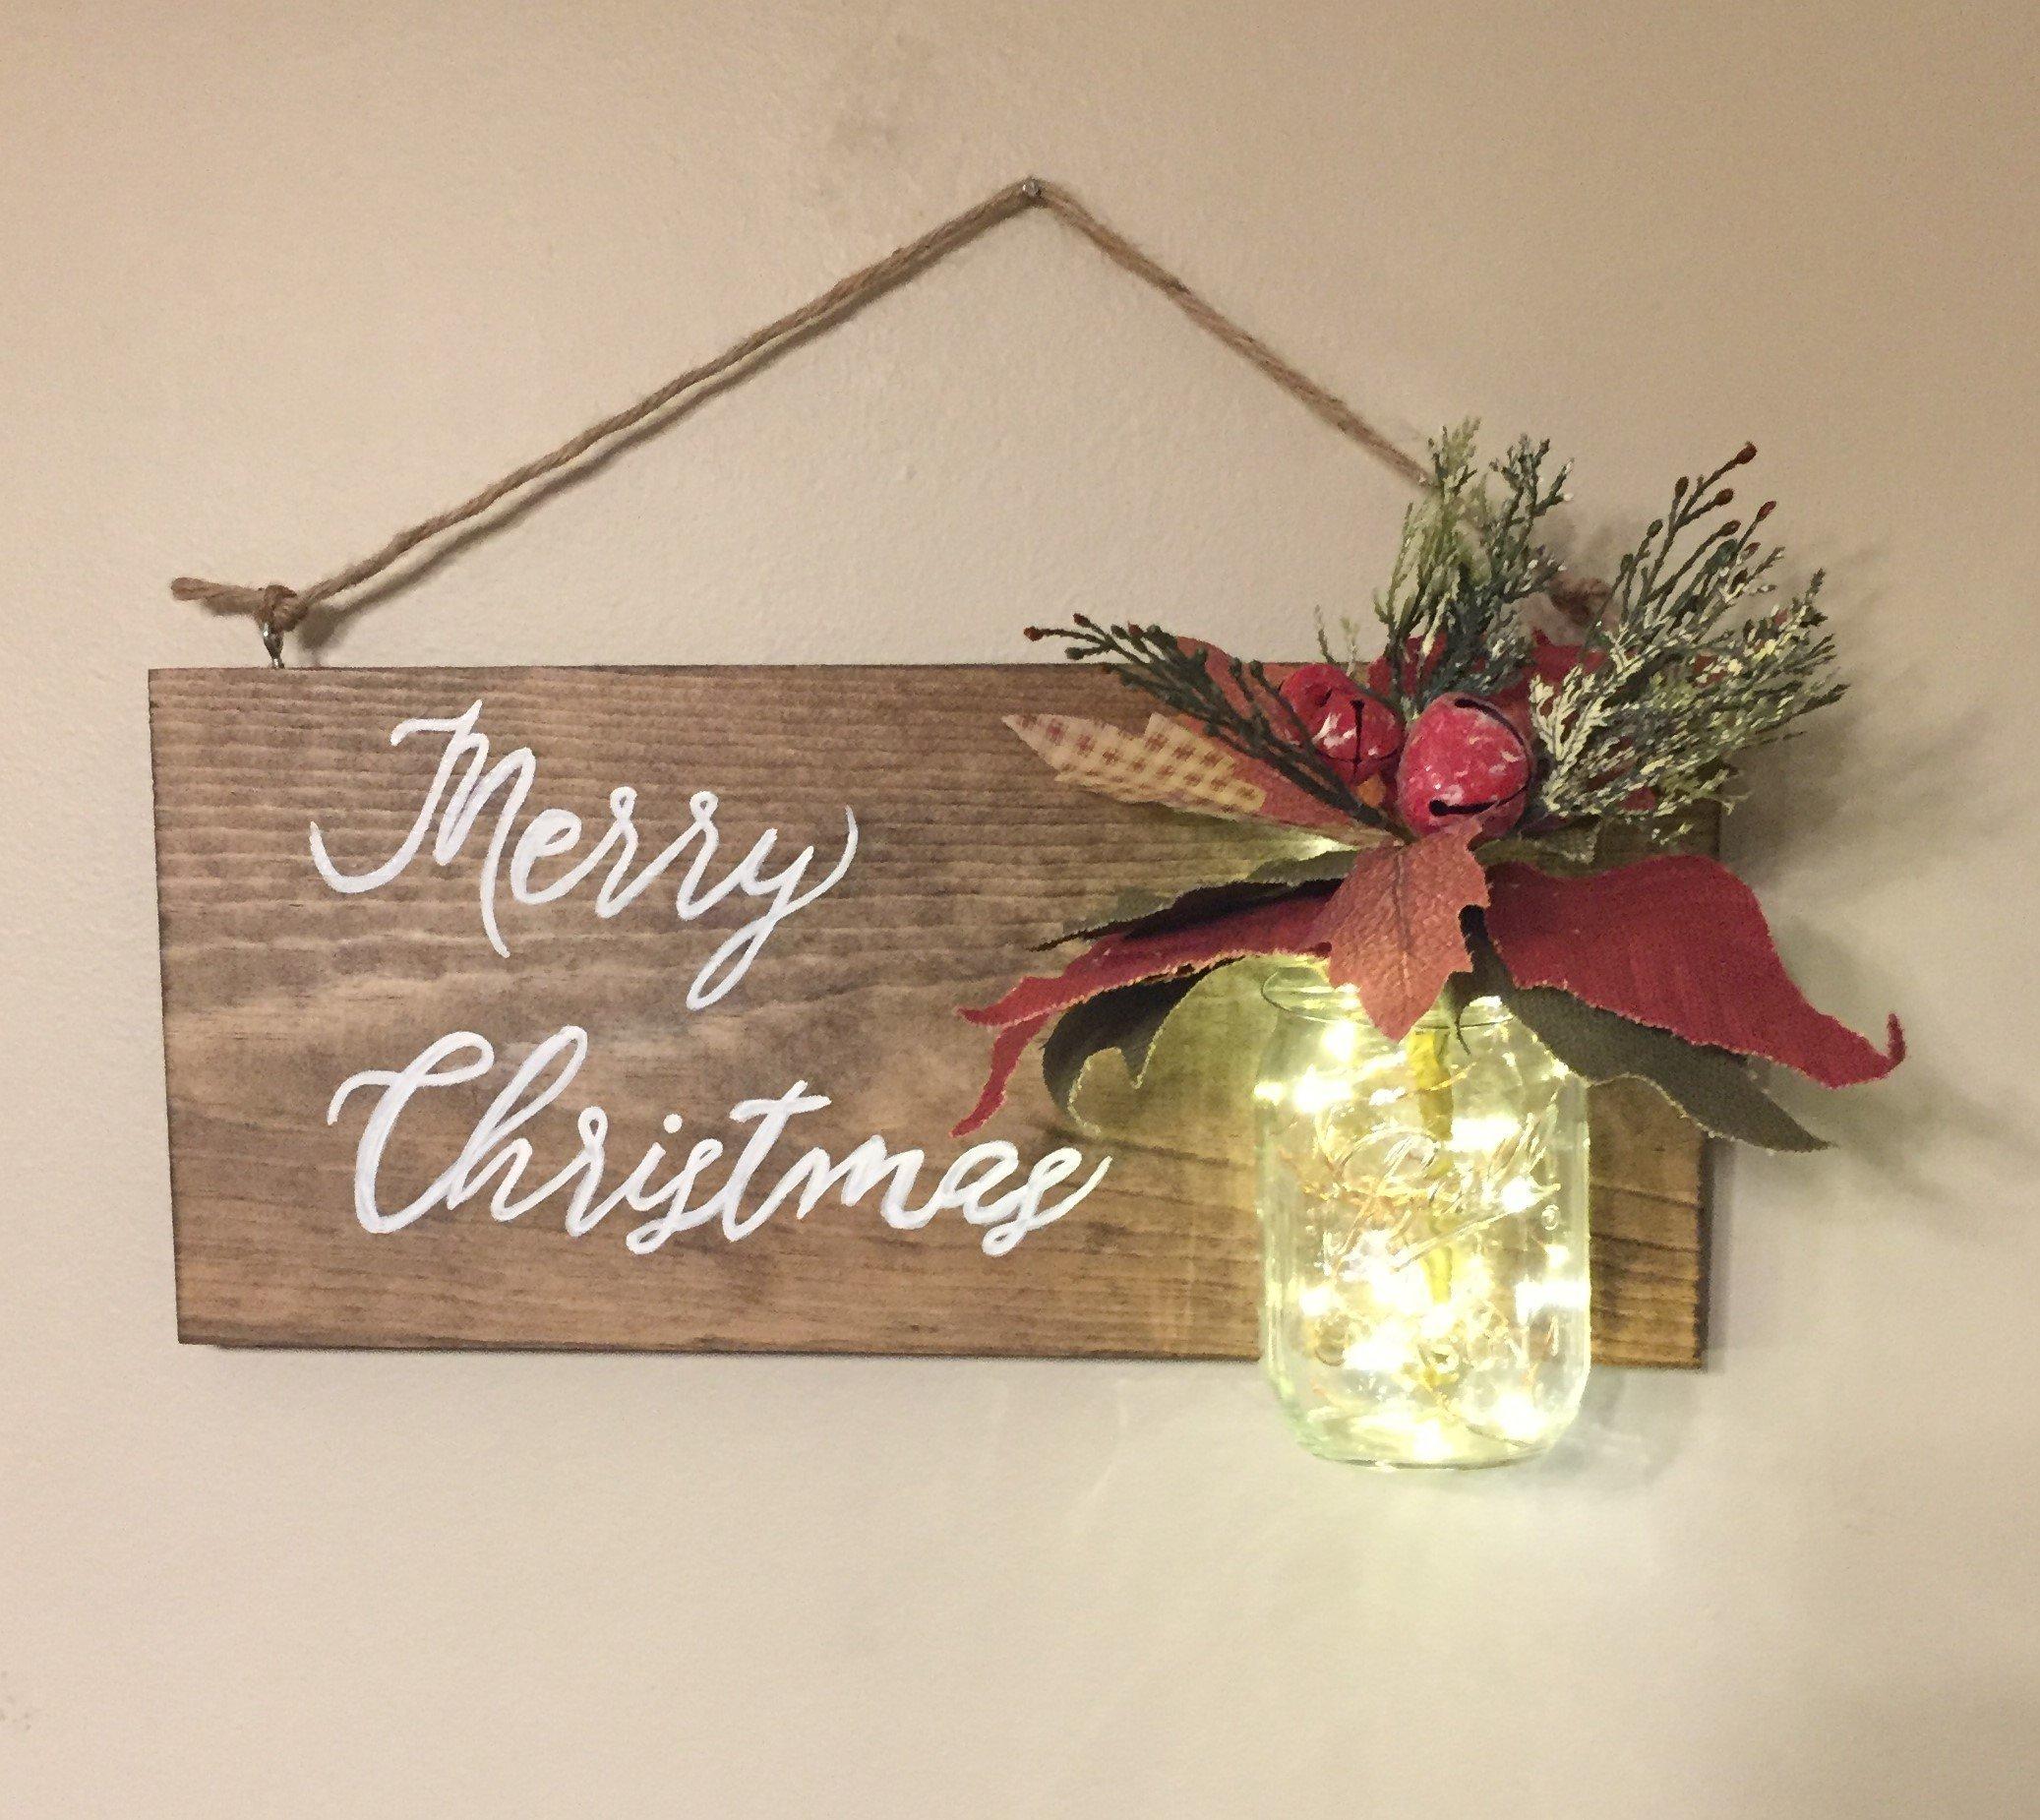 Rustic Farmhouse Christmas Wood Sign with Mason Jar, LED Fairy Lights and Vintage Poinsettia, Wall Sign, Home Decor